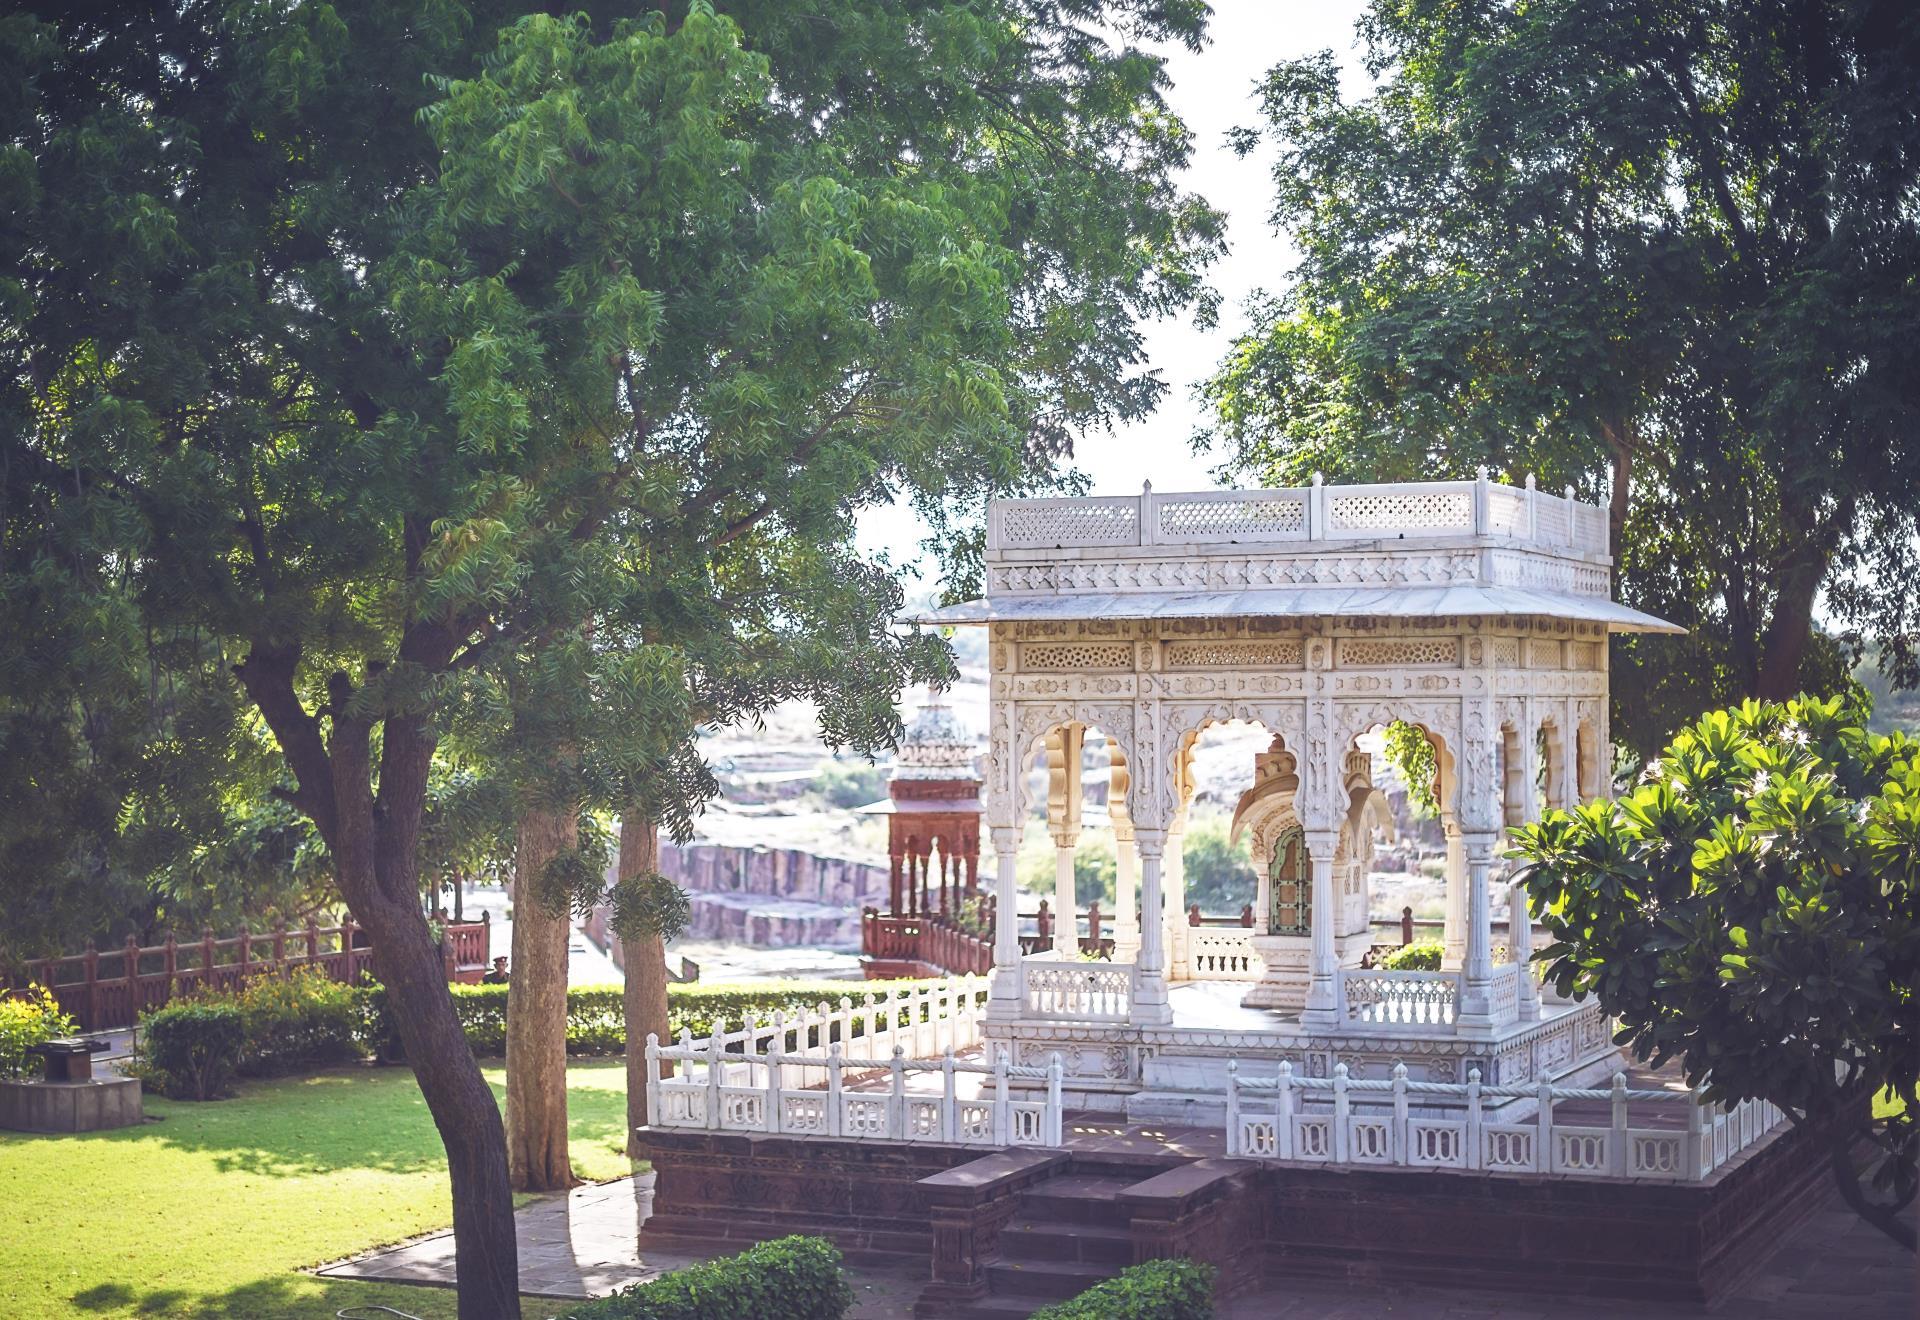 The Magical Rajasthan 7